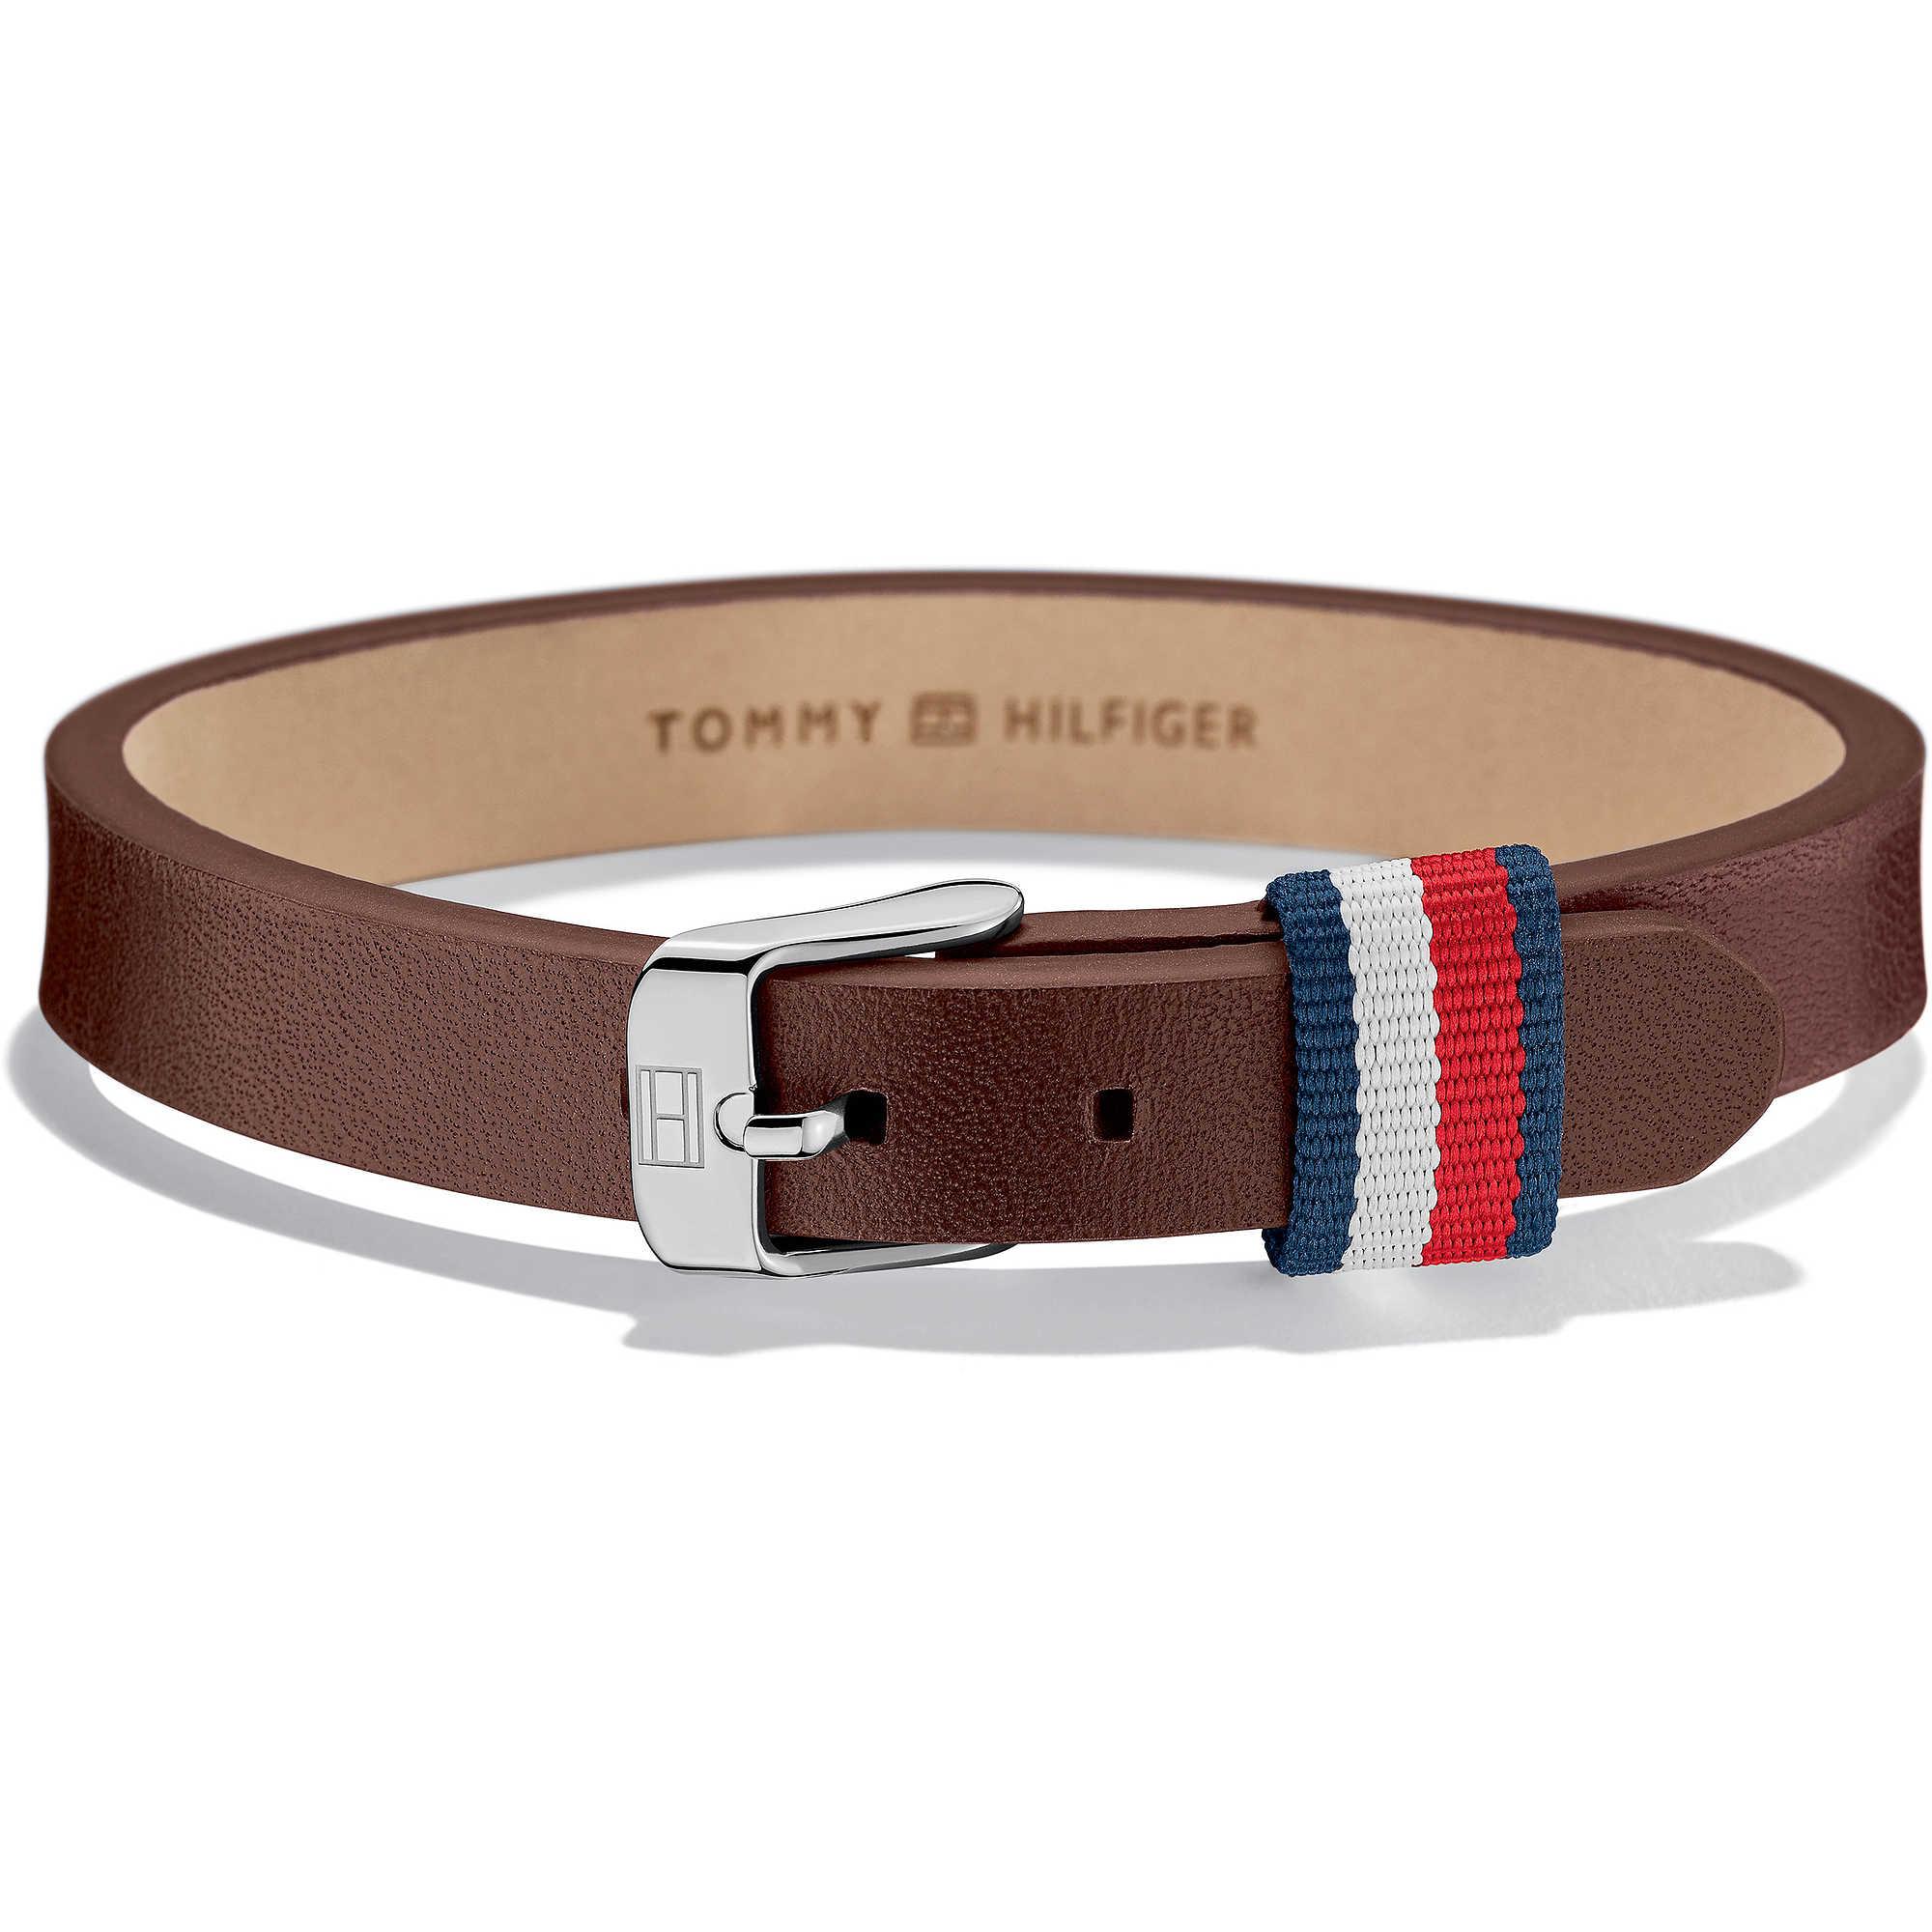 bracelet man jewellery tommy hilfiger mini belt thj2700957 bracelets tommy hilfiger. Black Bedroom Furniture Sets. Home Design Ideas